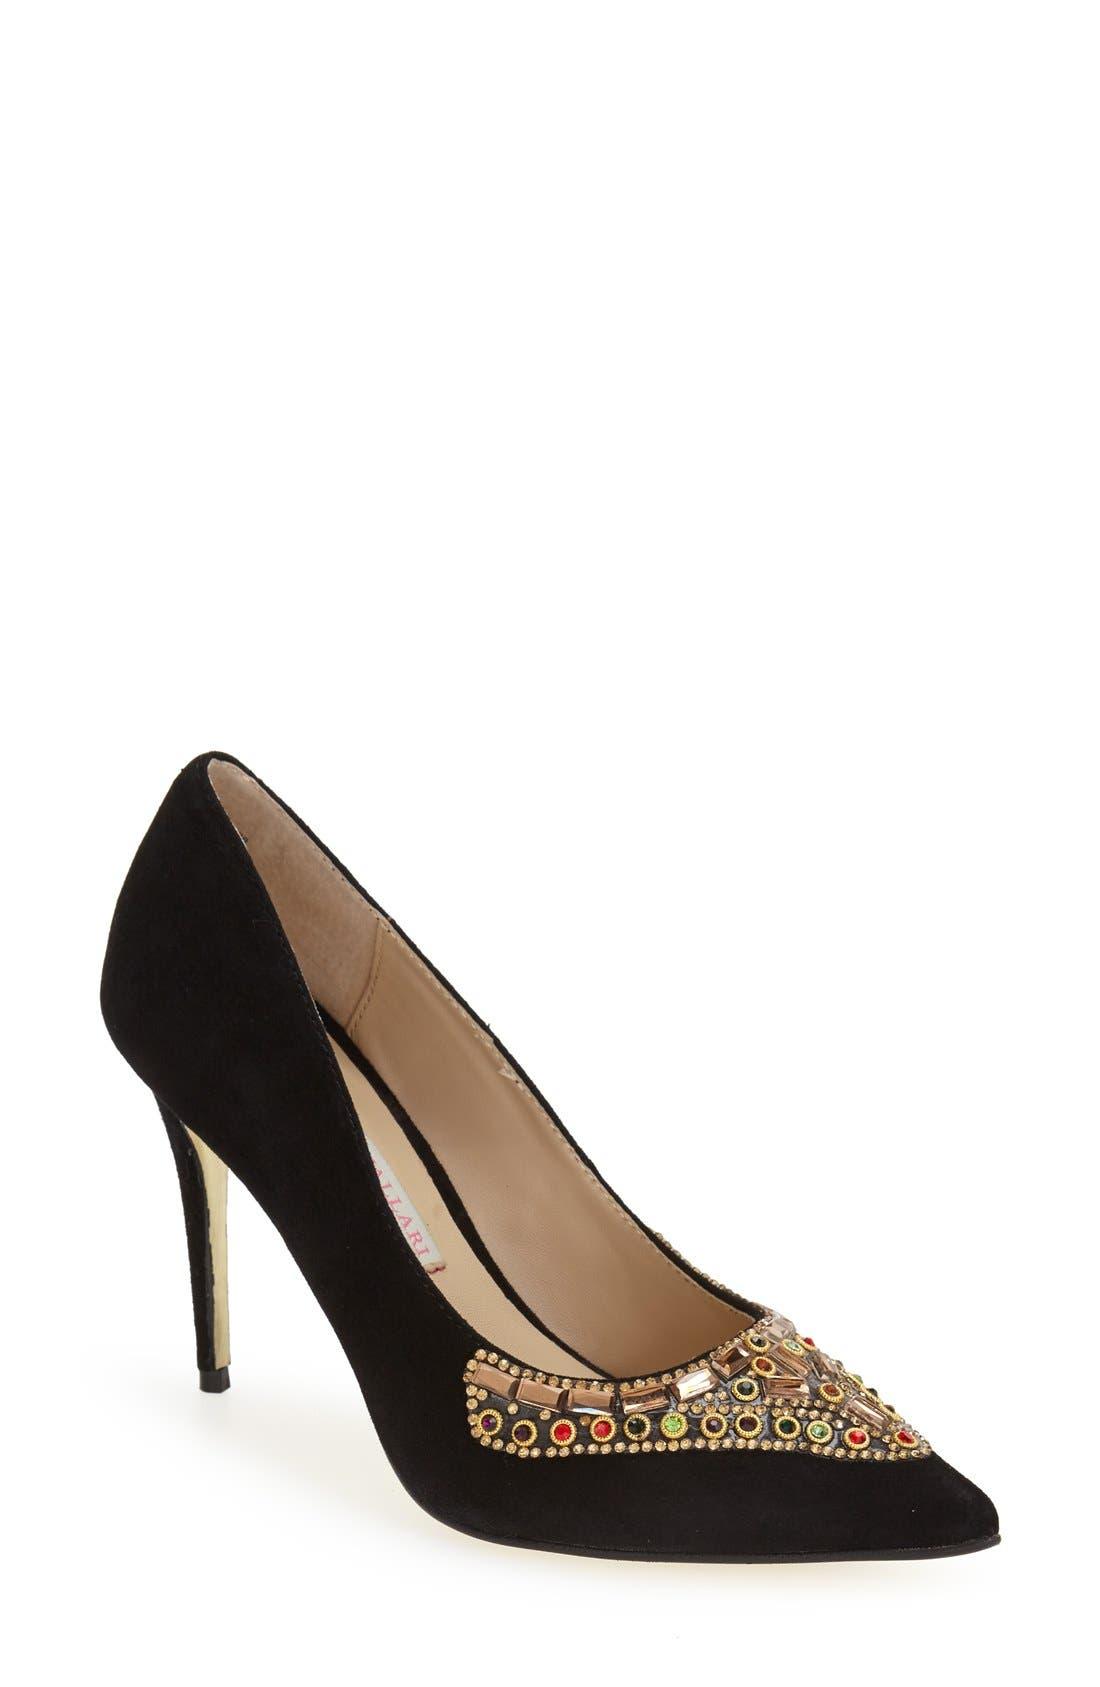 Alternate Image 1 Selected - Kristin Cavallari 'Dani' Embellished Pointy Toe Pump (Women)